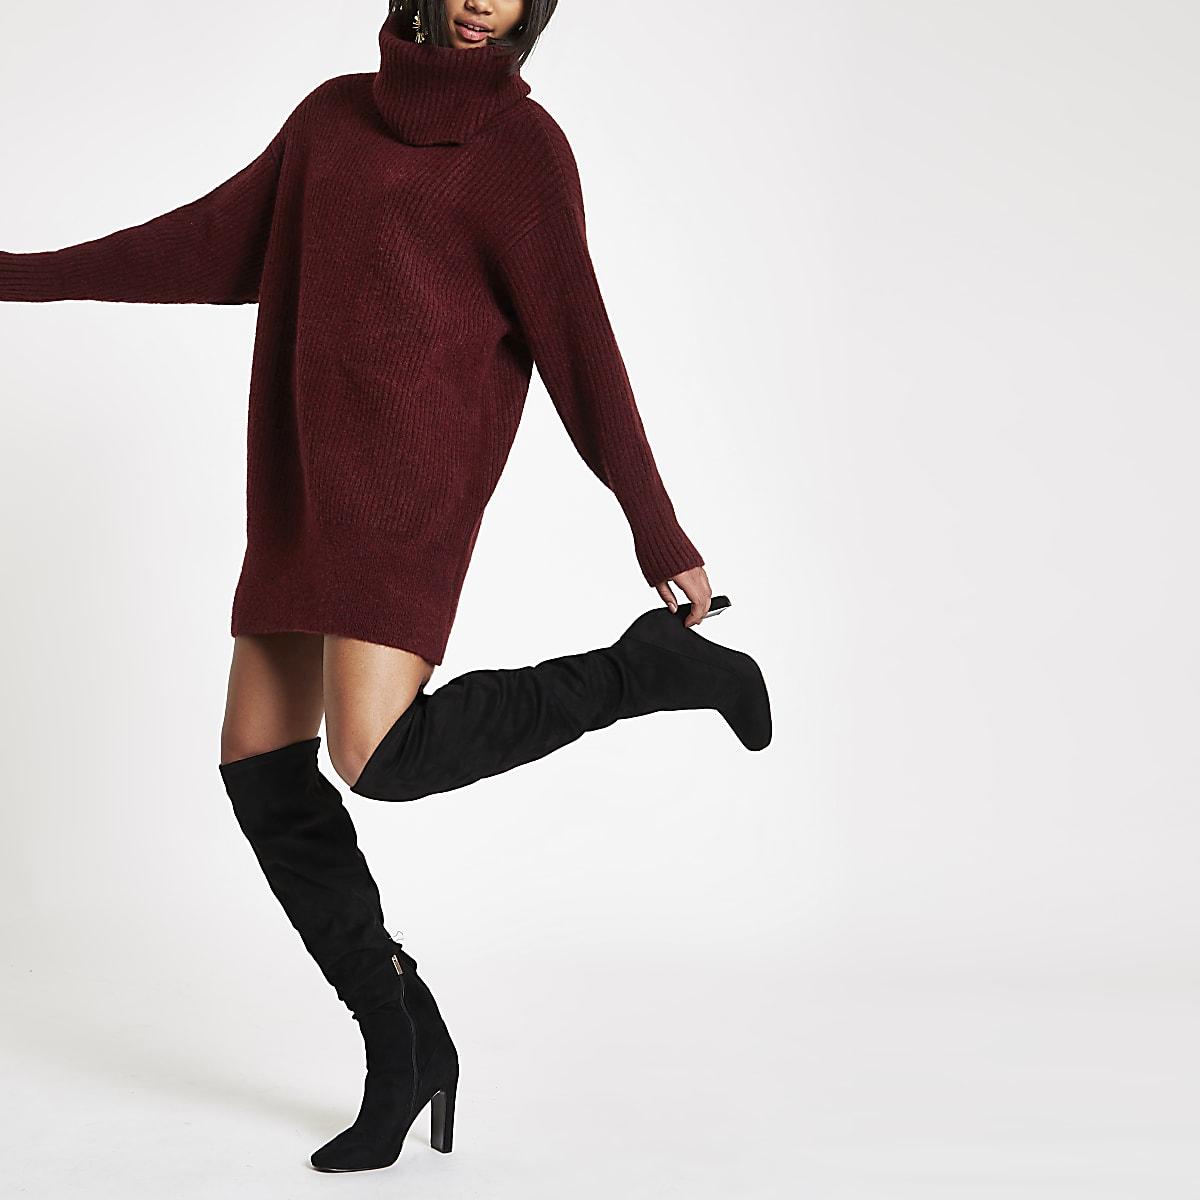 6e7d71e019376d Bordeauxrode gebreide trui-jurk met col - Pullovers - Knitwear - Dames